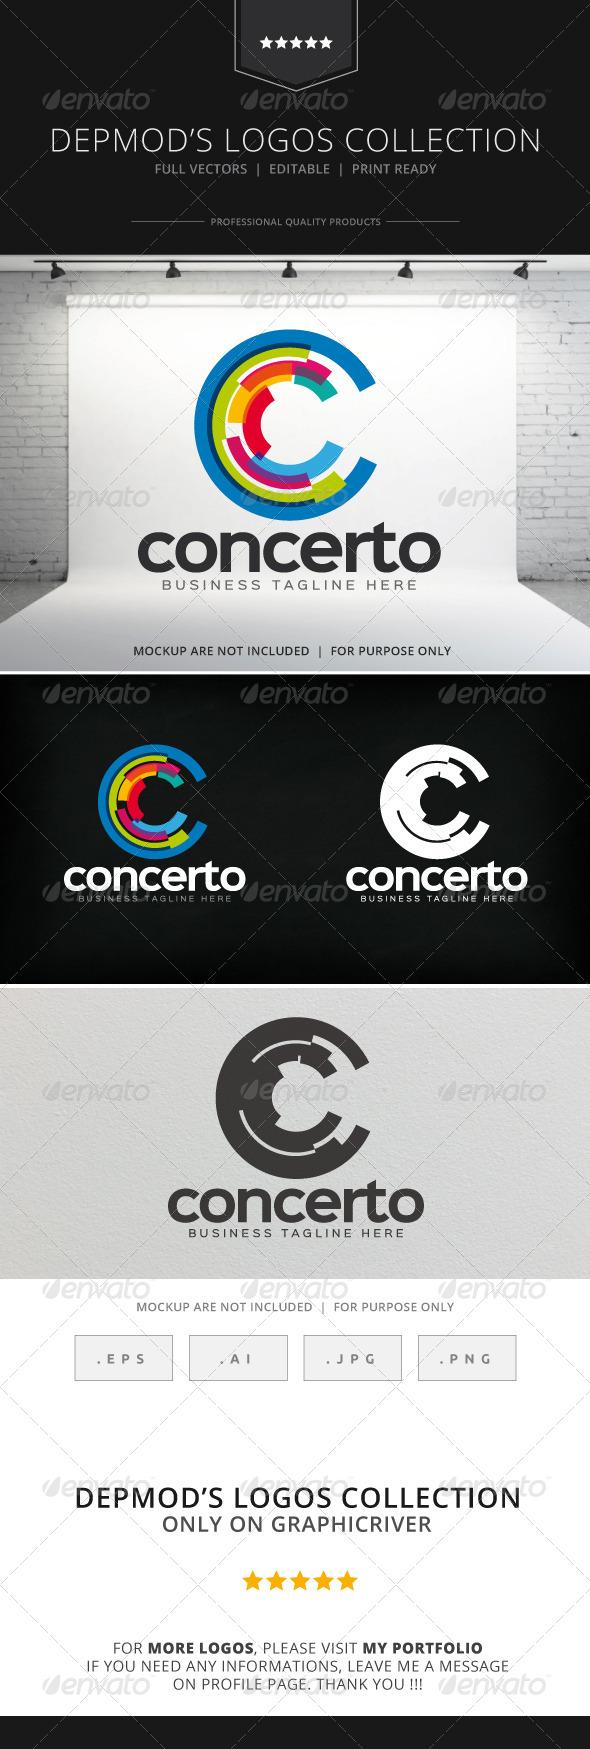 GraphicRiver Concerto Logo 8523302